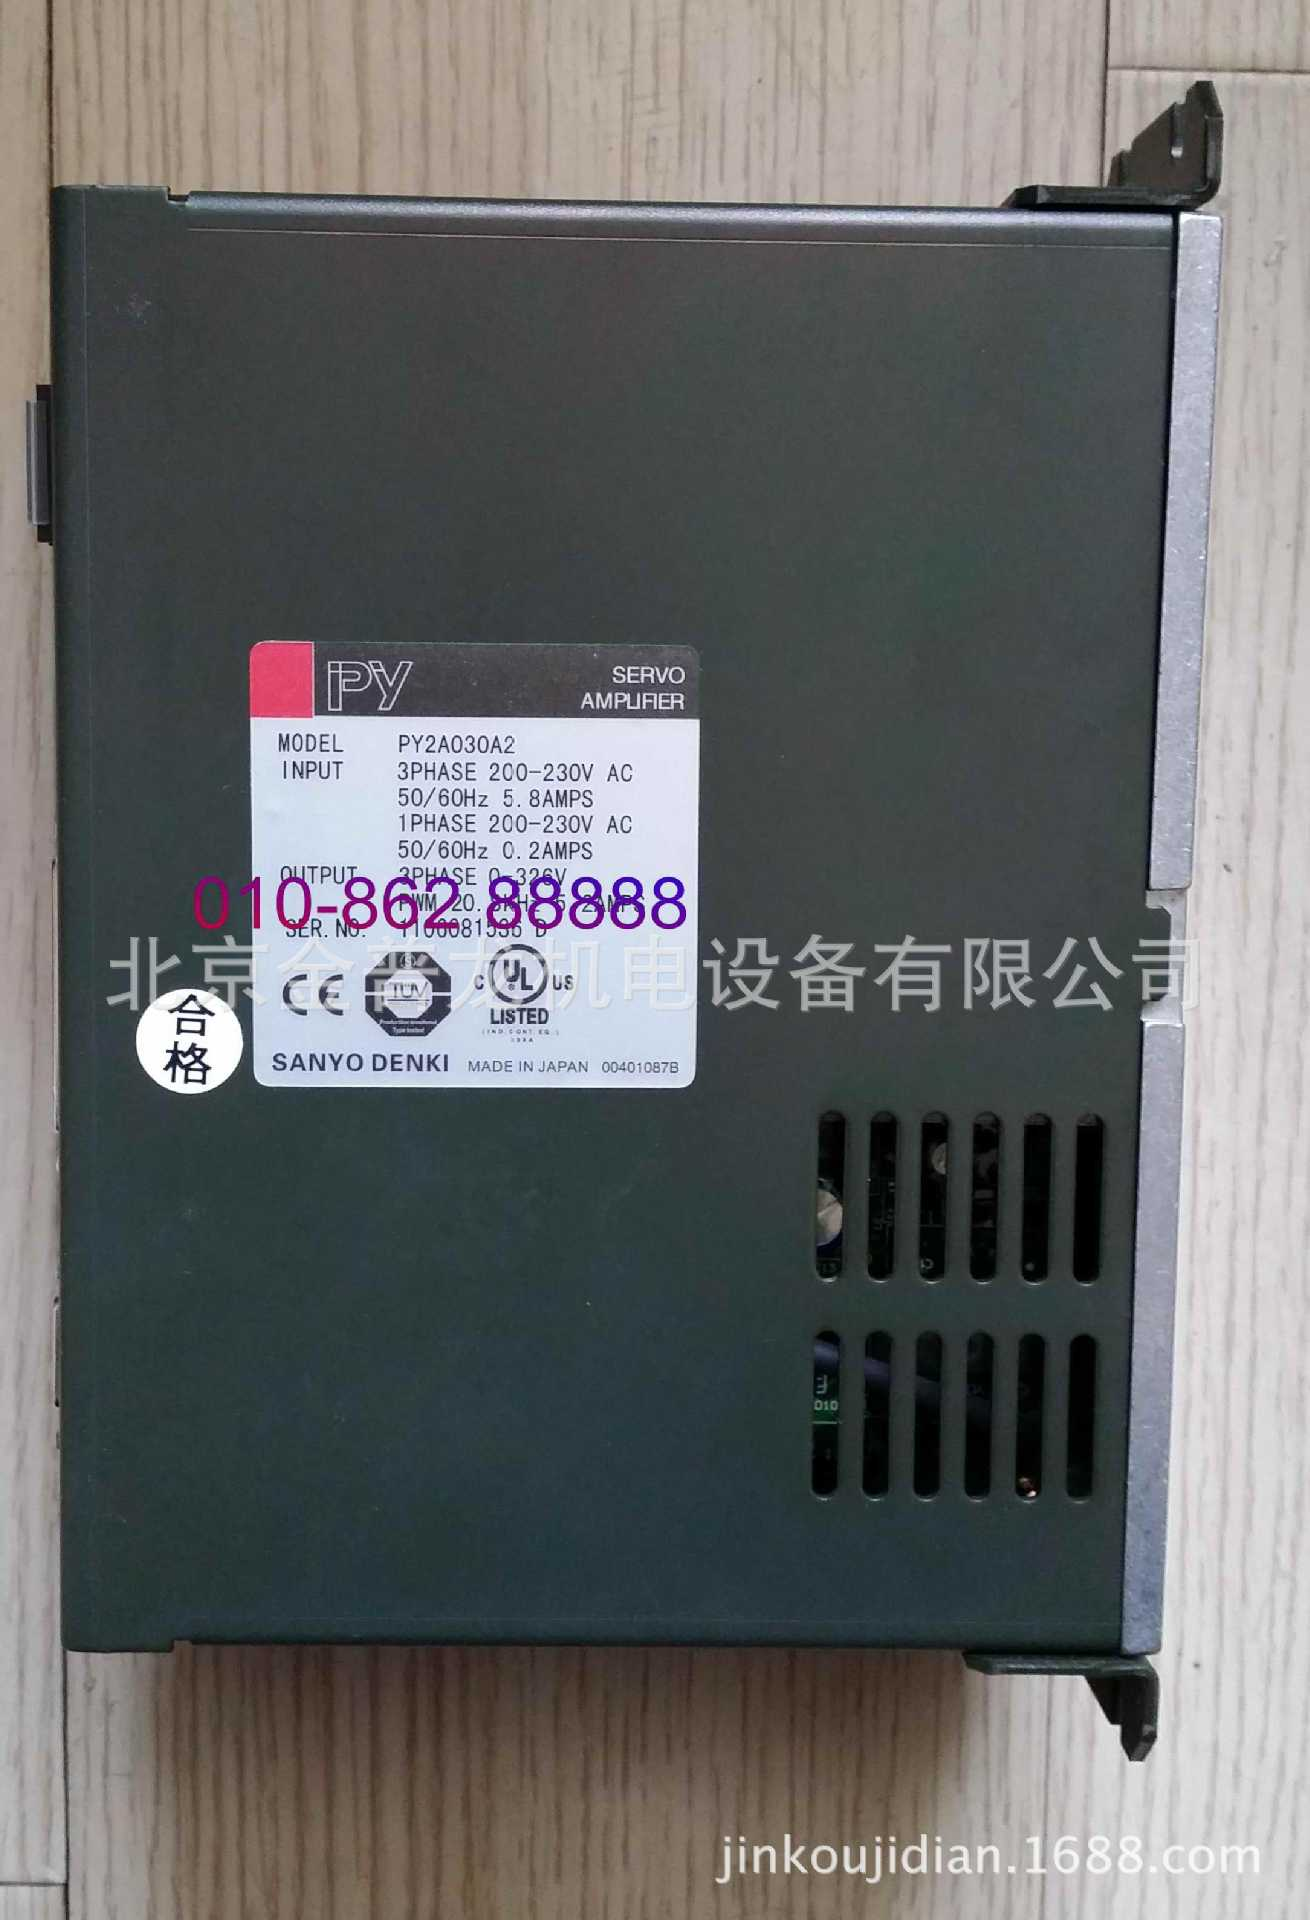 PY2A030A2 全新现货sanyo denki伺服驱动器议价 实拍 库存